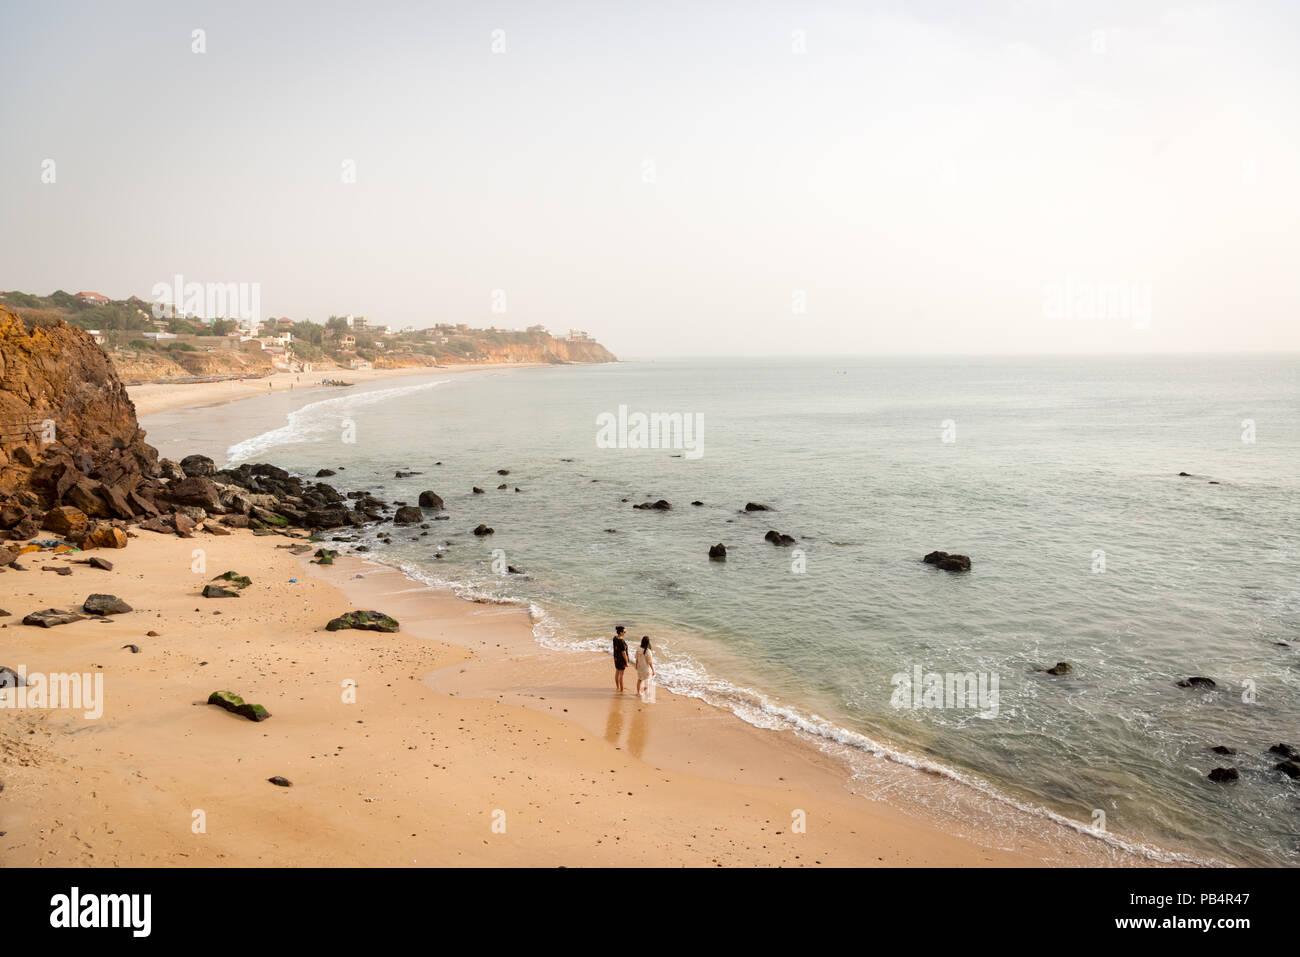 La playa de Toubab Diaolao, Senegal Imagen De Stock